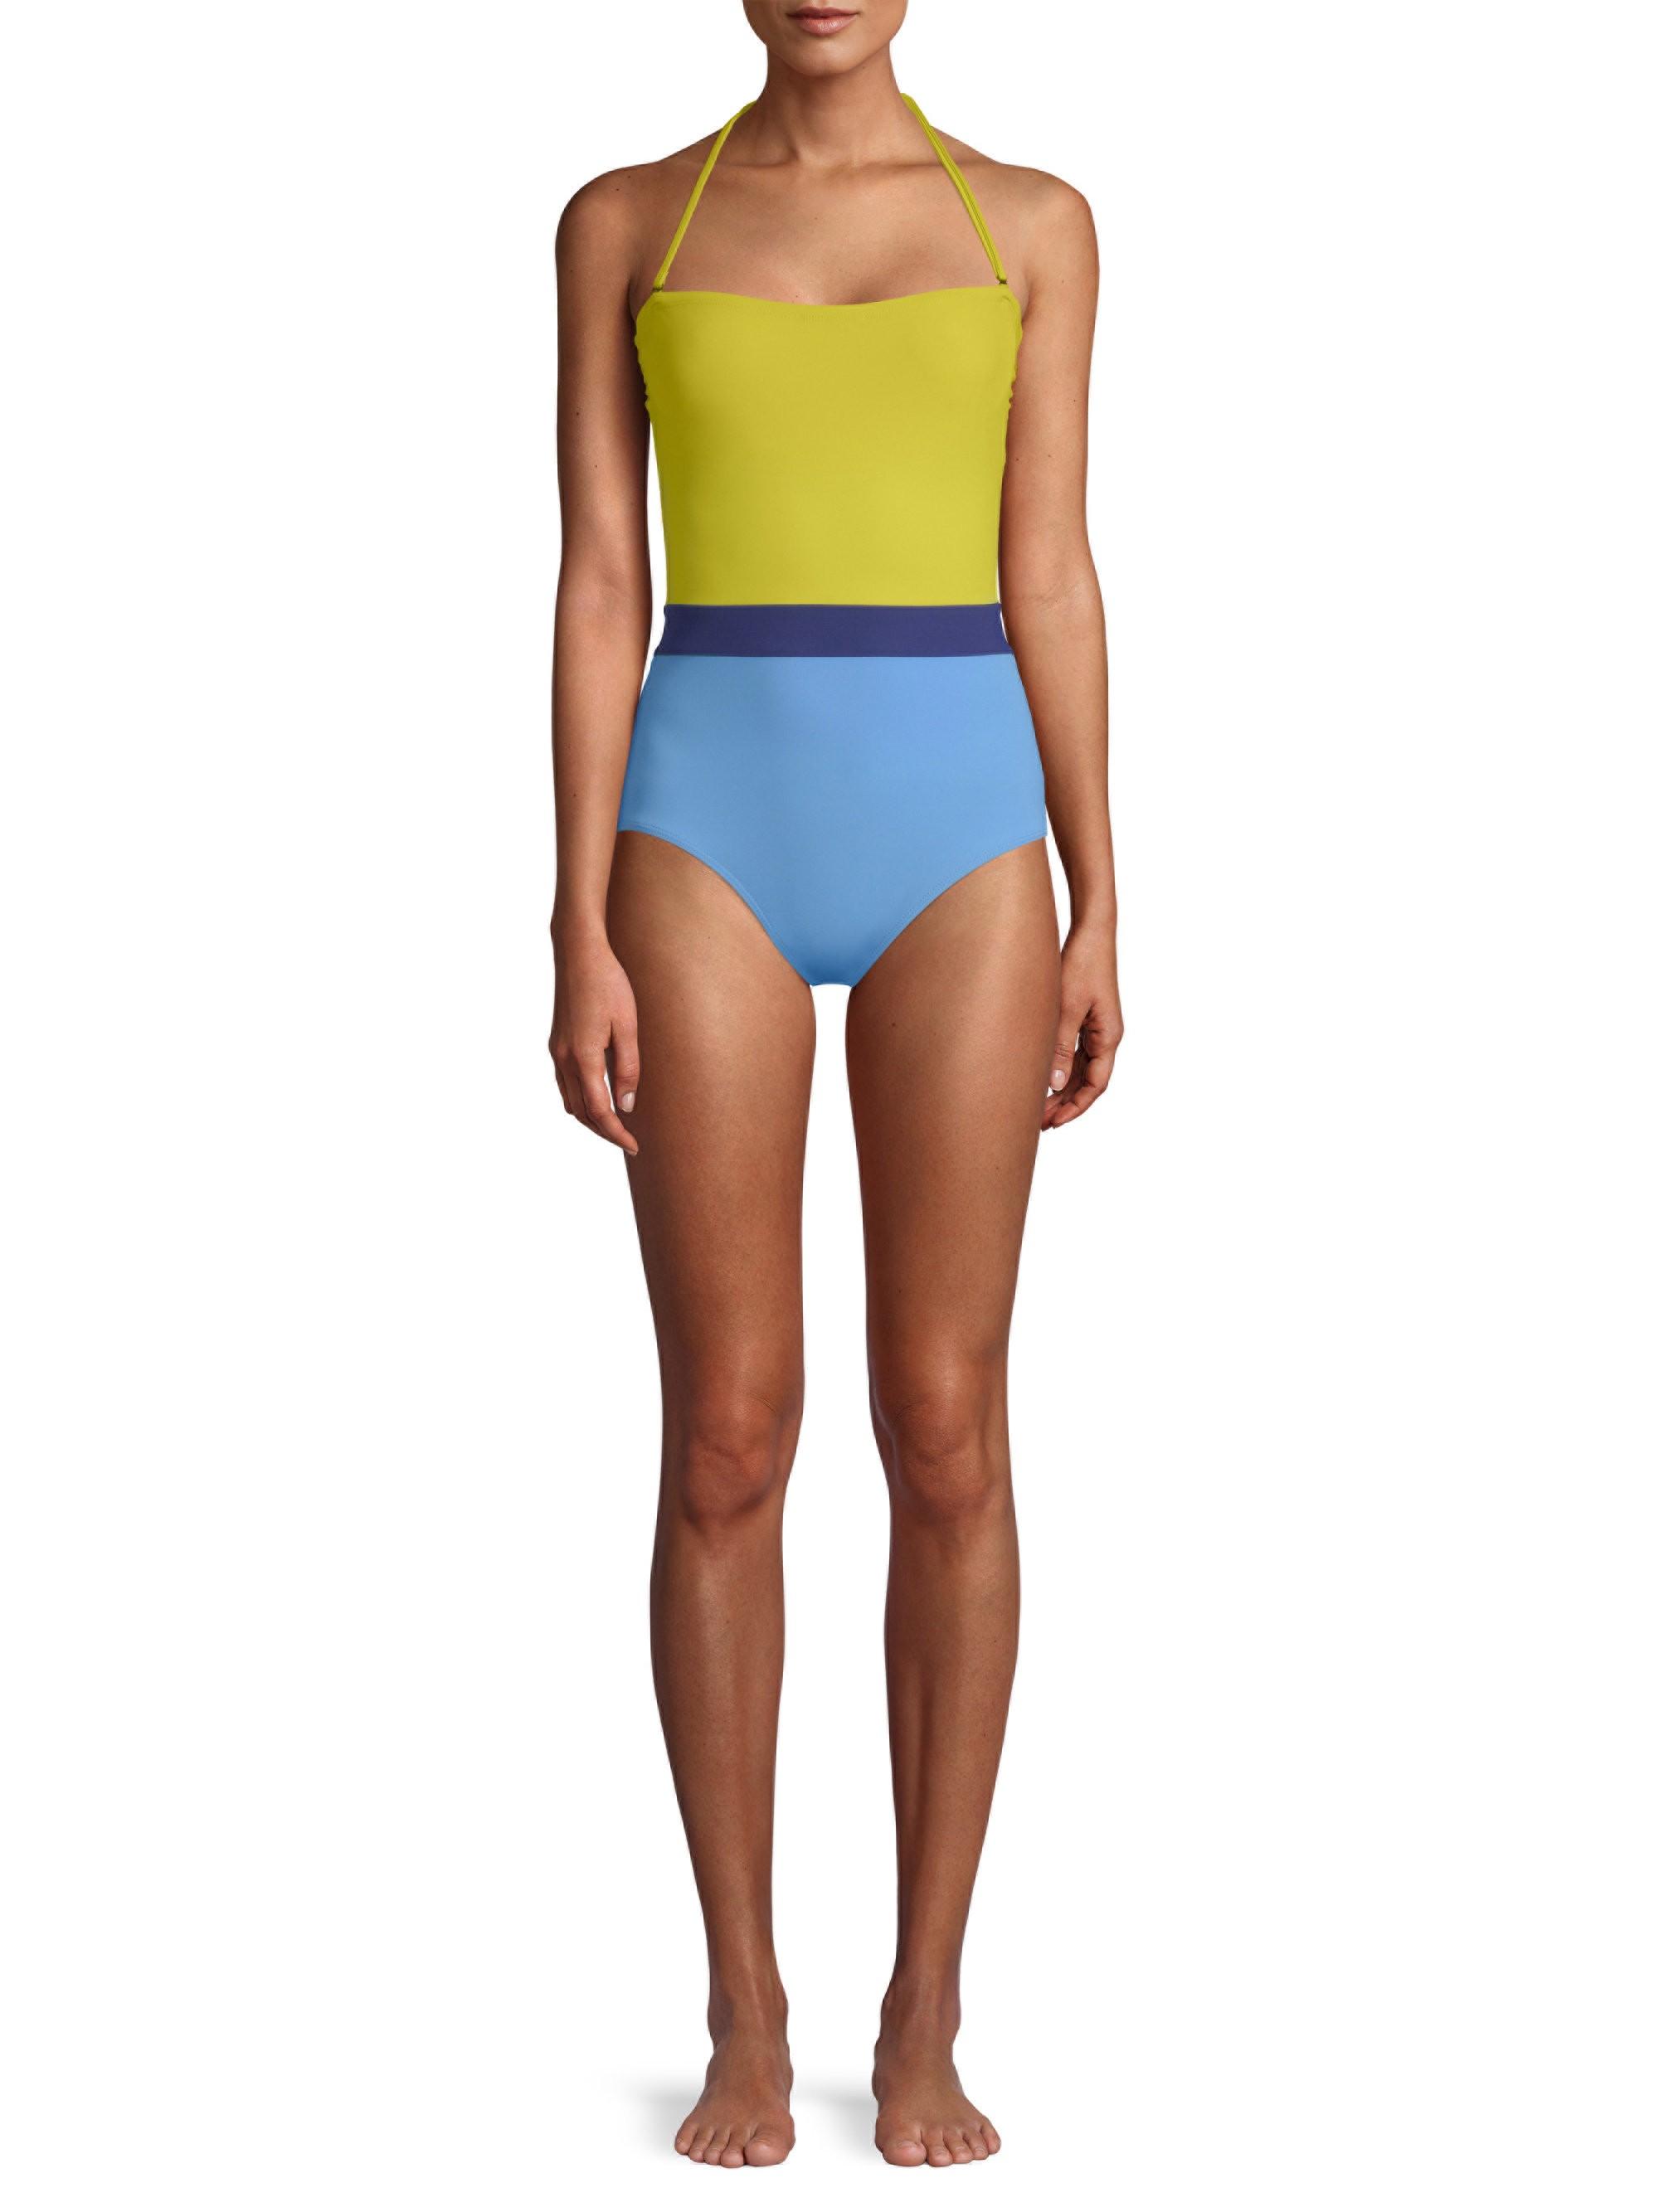 3a5228a7c48 Flagpole Rita One-Piece Swimsuit - White Key Medium in 2019 ...